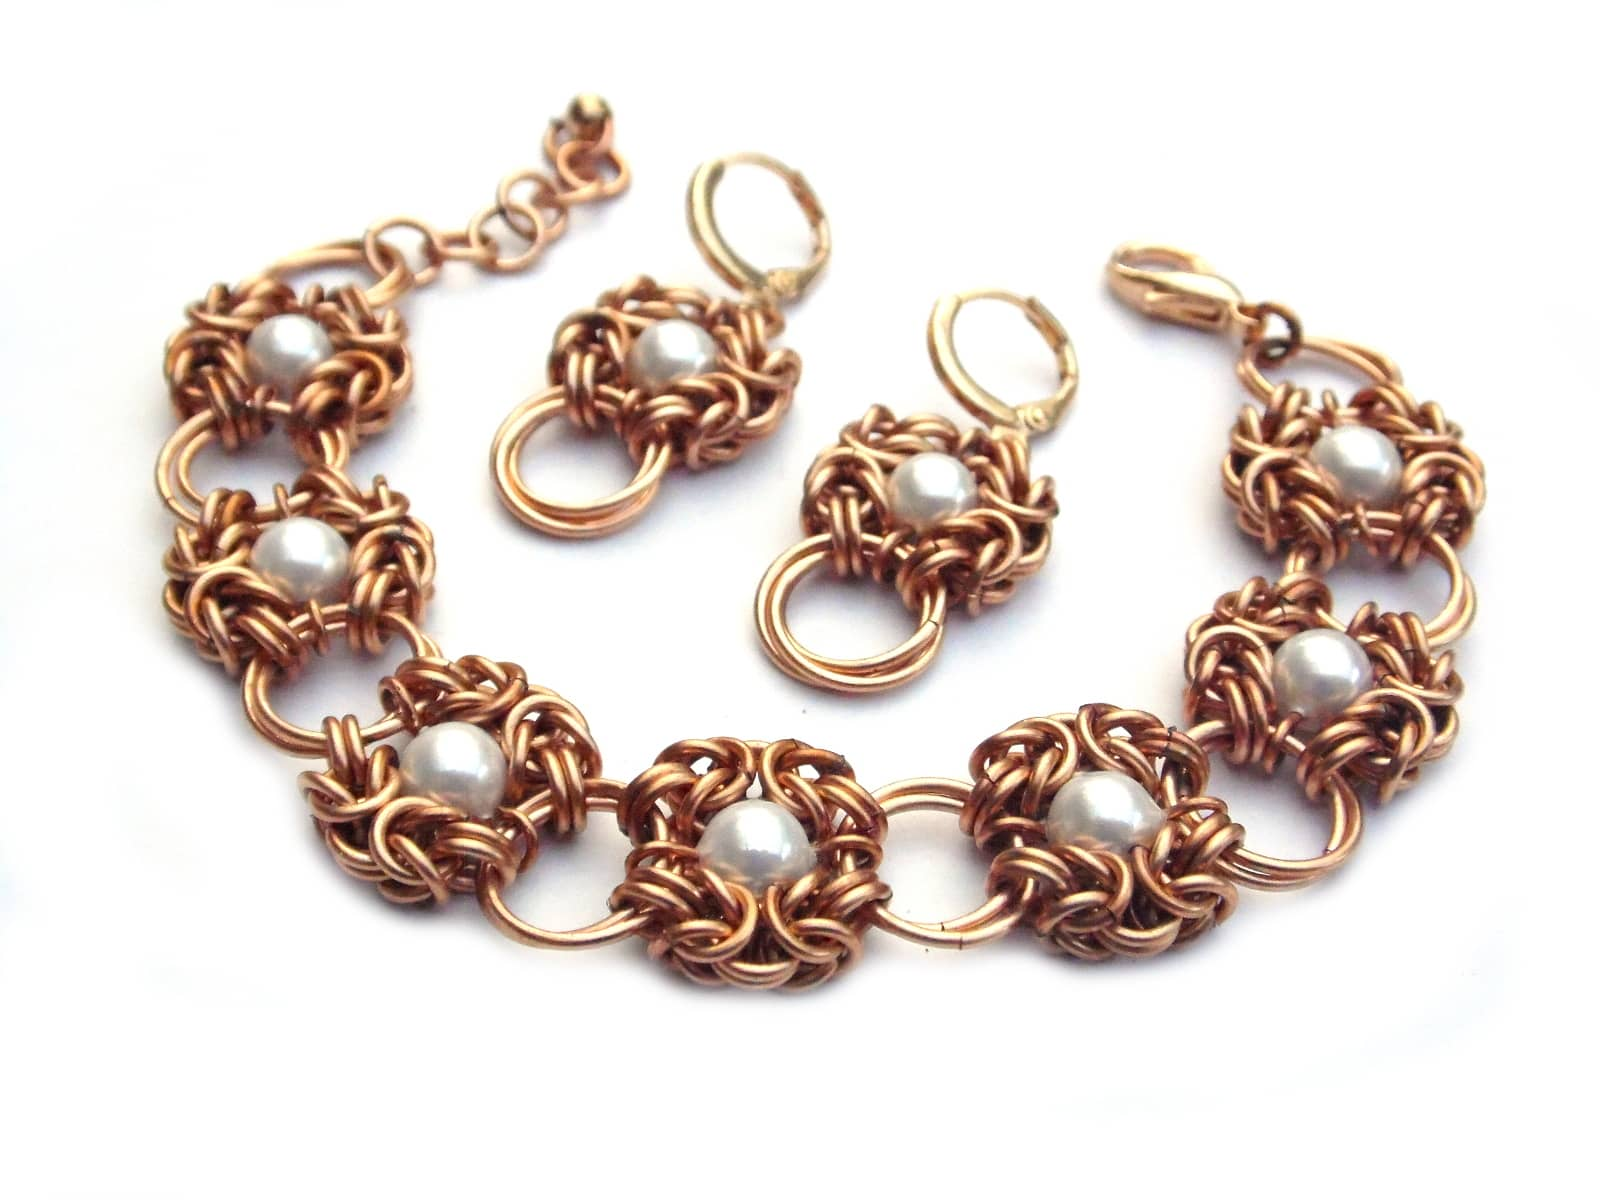 Komplet chainmaille z brązu z perłami